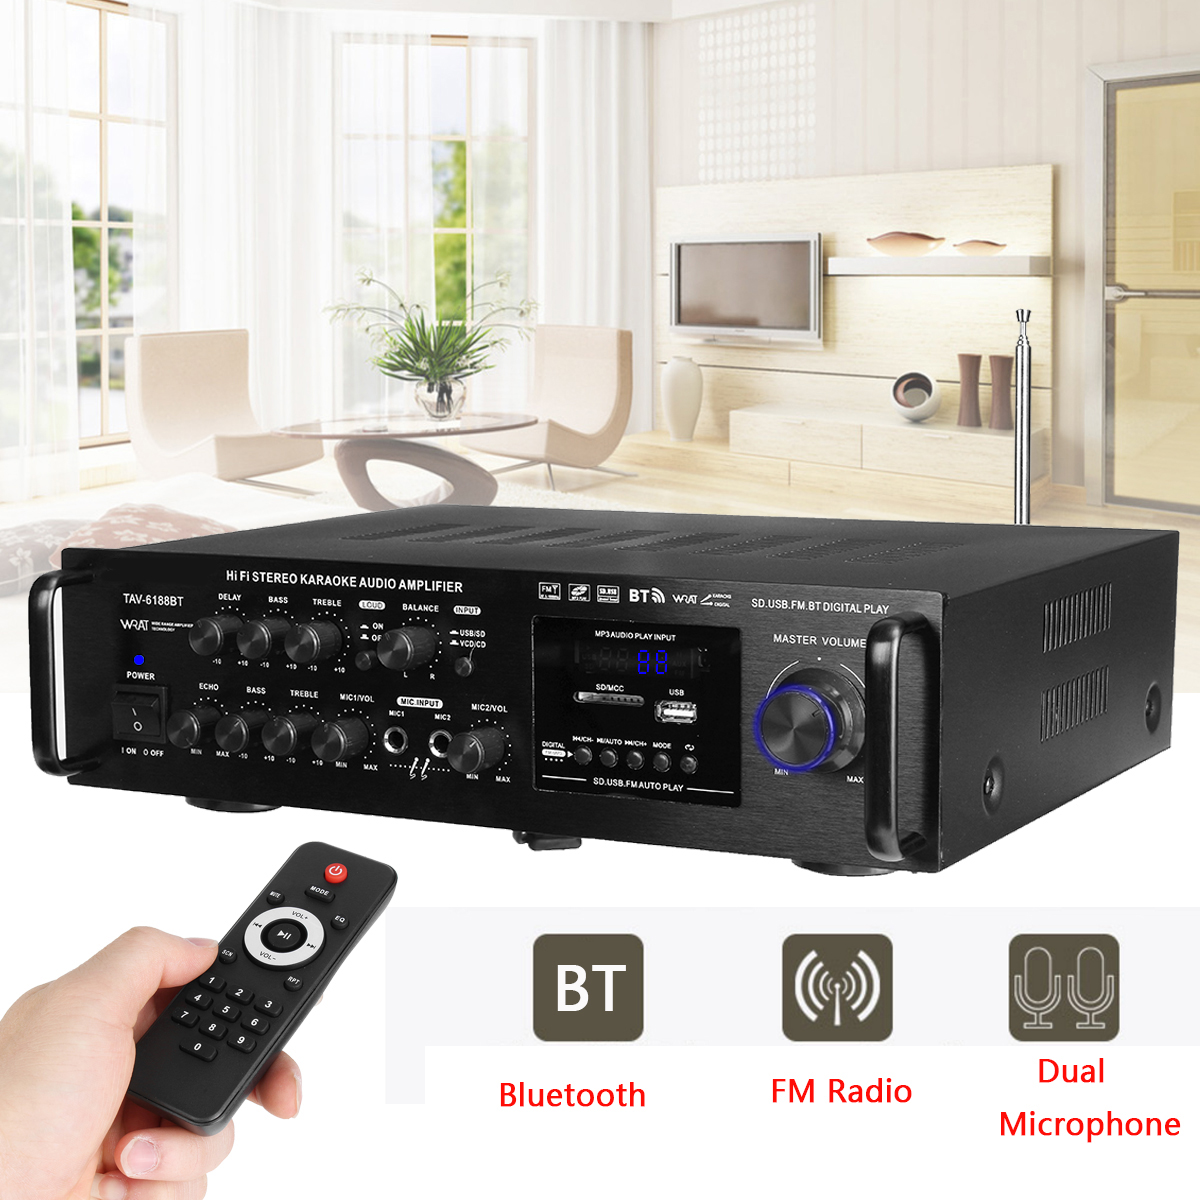 лучшая цена New HIFI Stereo Karaoke Audio Amplifiers 2000W Home Car Bluetooth Karaoke Amplifier Wireless Version Digital Audio Amplifiers